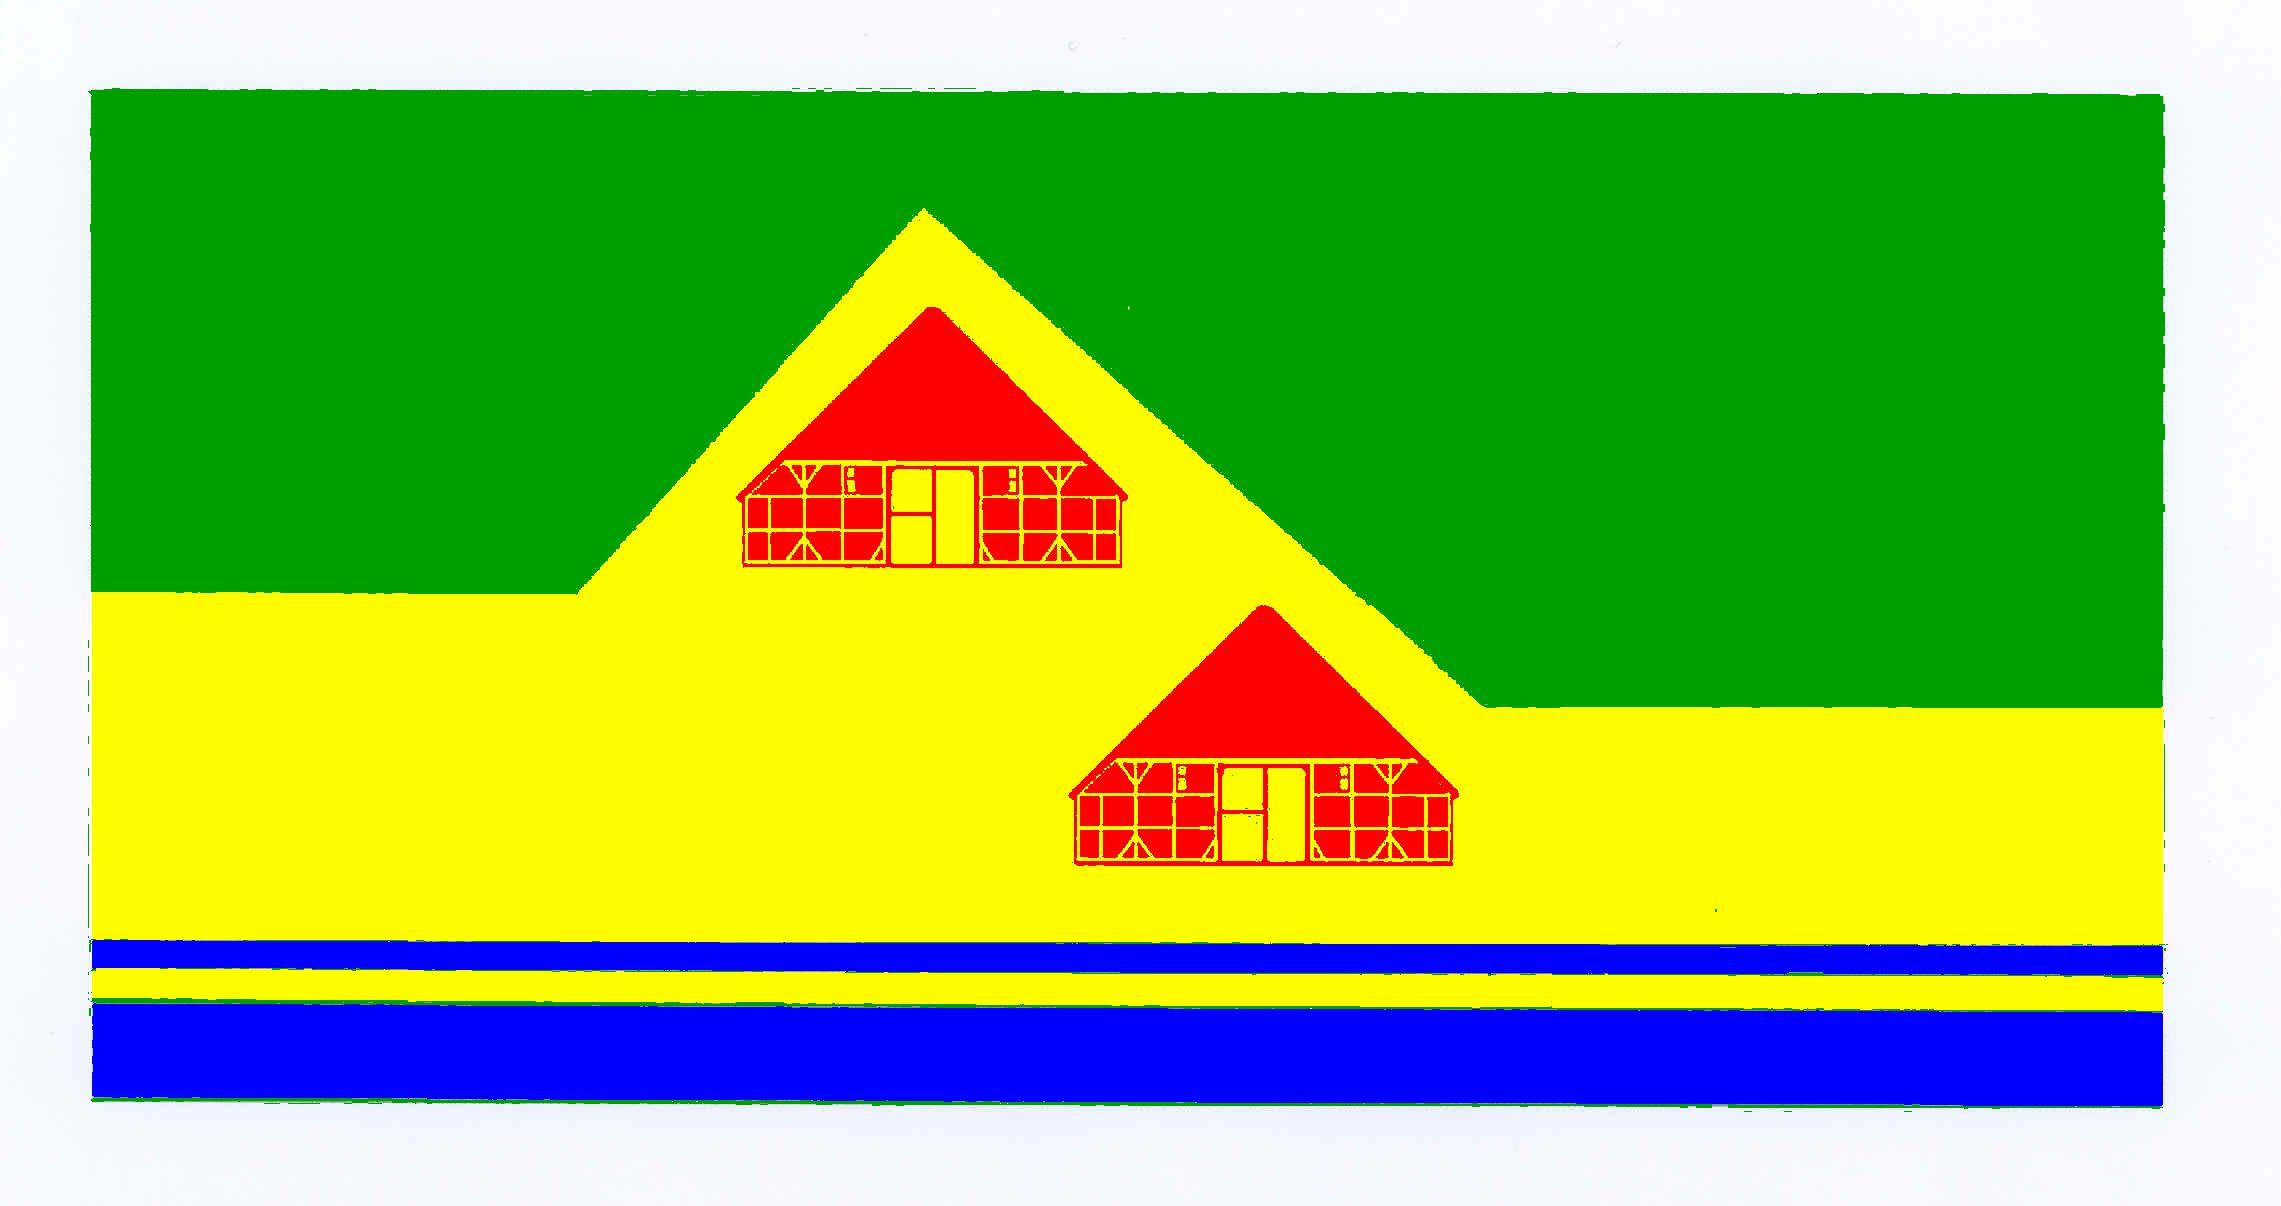 Flagge GemeindeWinnert, Kreis Nordfriesland